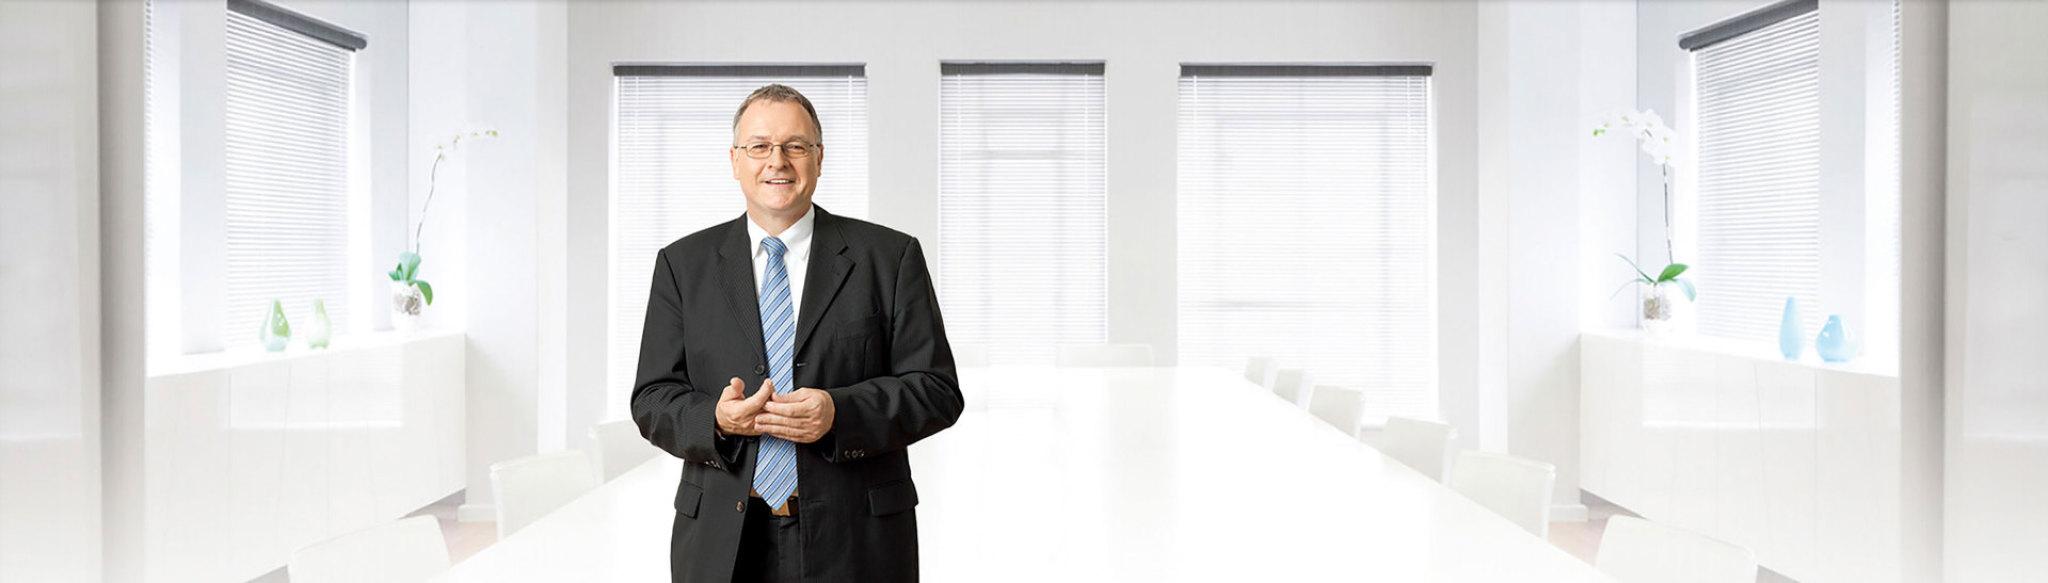 Agilitas Consulting GmbH